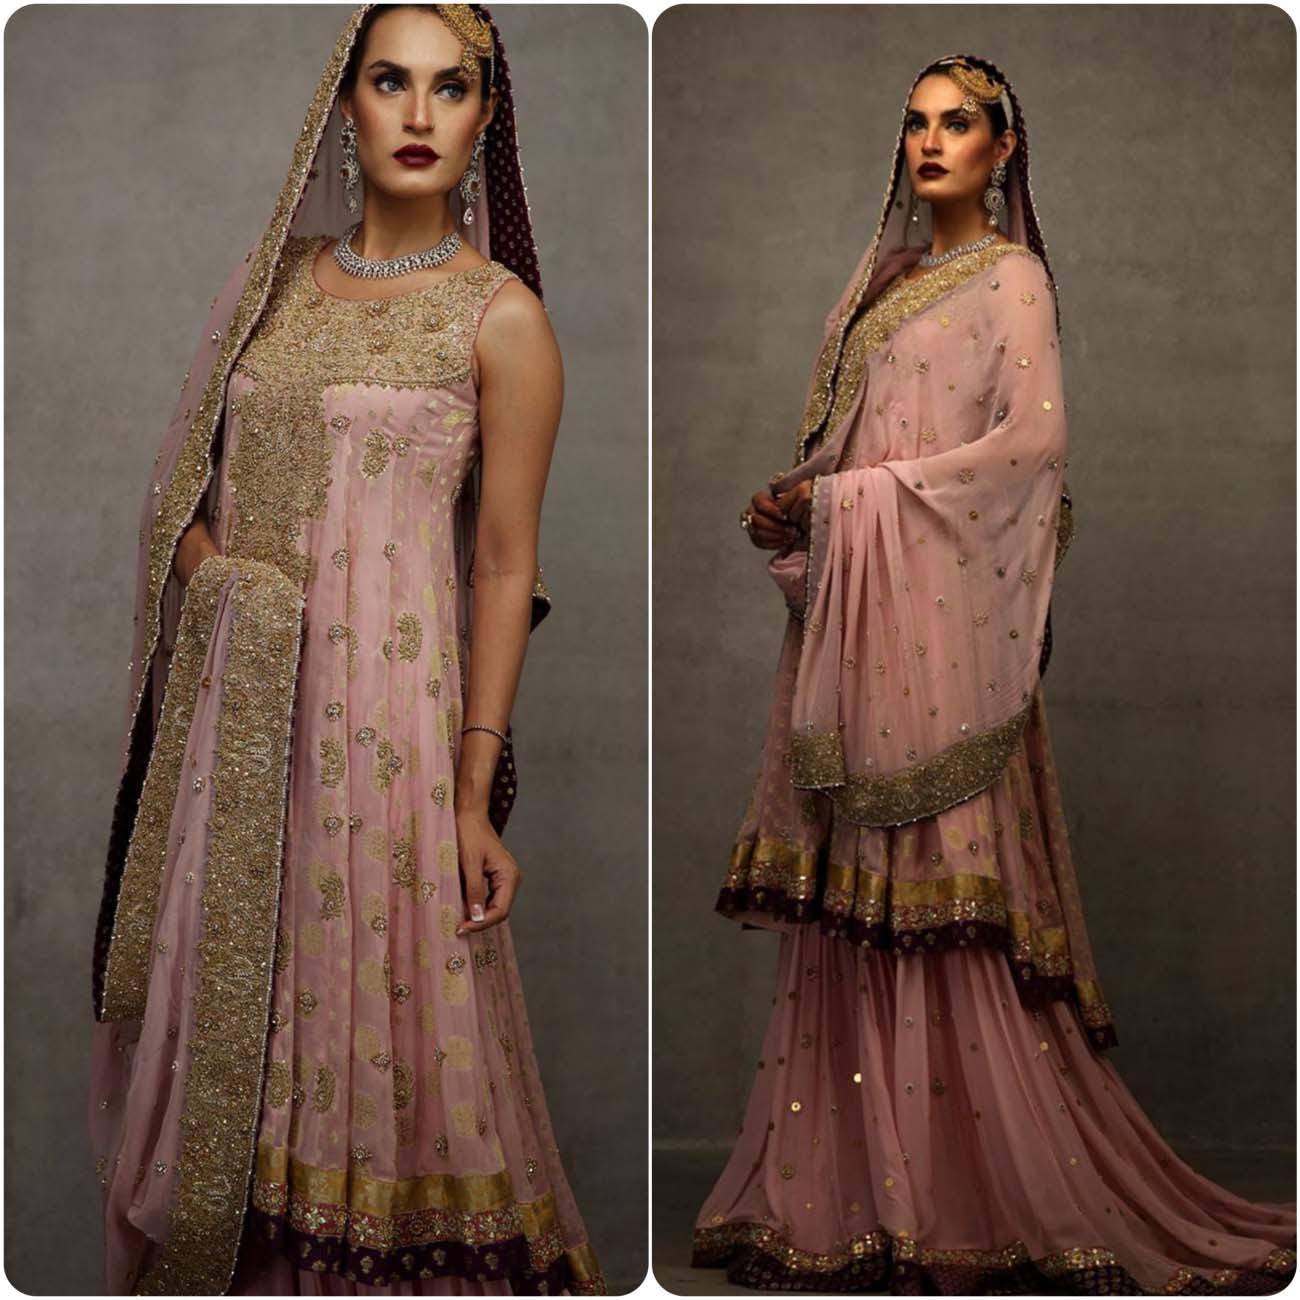 Deepak perwani Wedding Dresses Collection Fo Women 2016-2017...styloplanet (5)